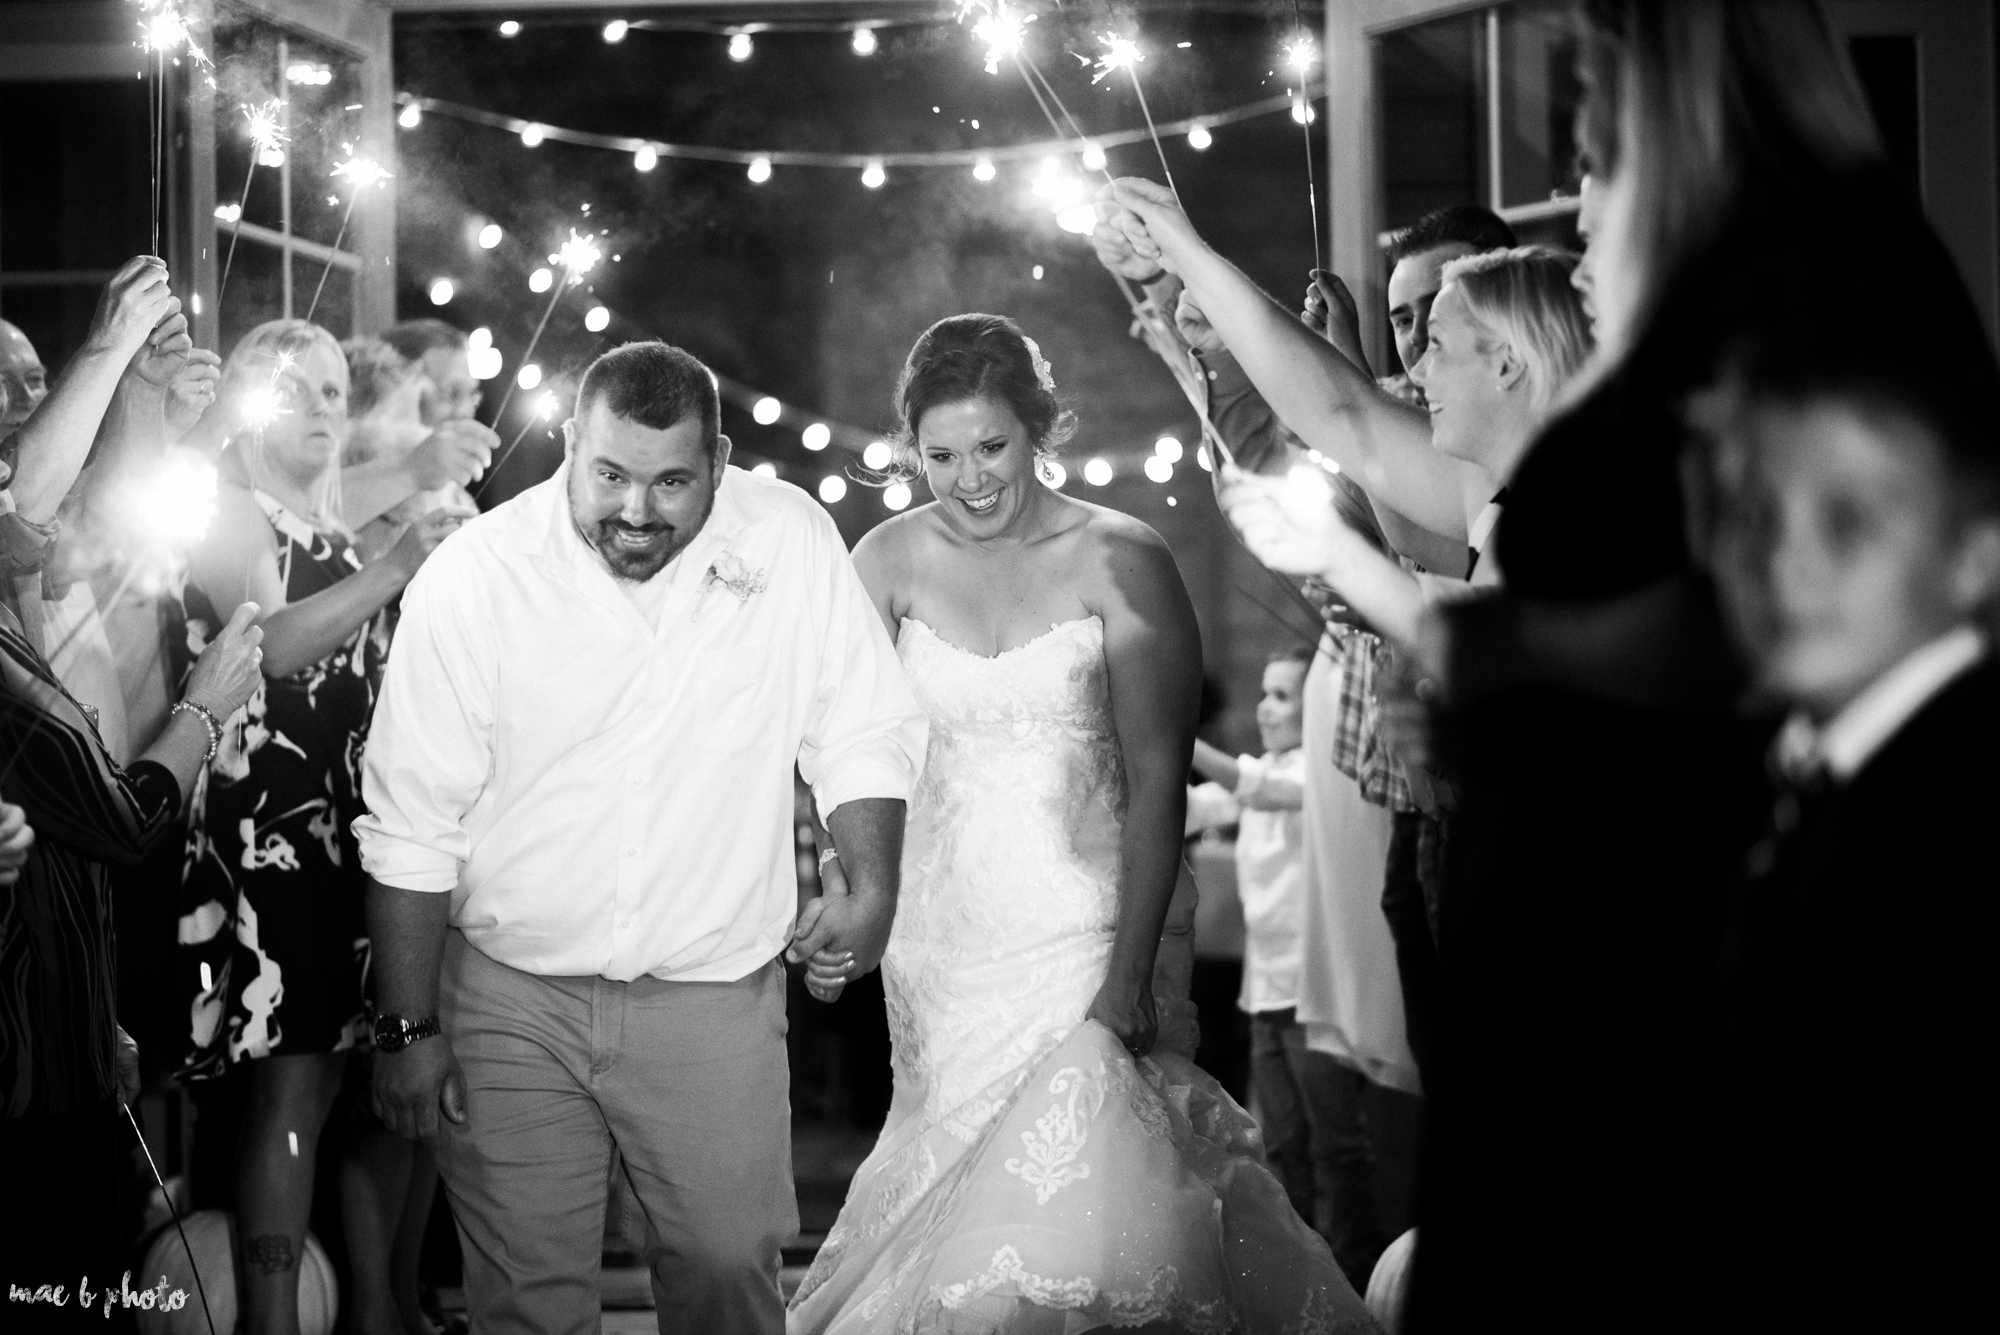 Sarah & Dustin's Rustic Chic Barn Wedding at Hartford Hill Winery in Hartford, Ohio by Mae B Photo-109.jpg